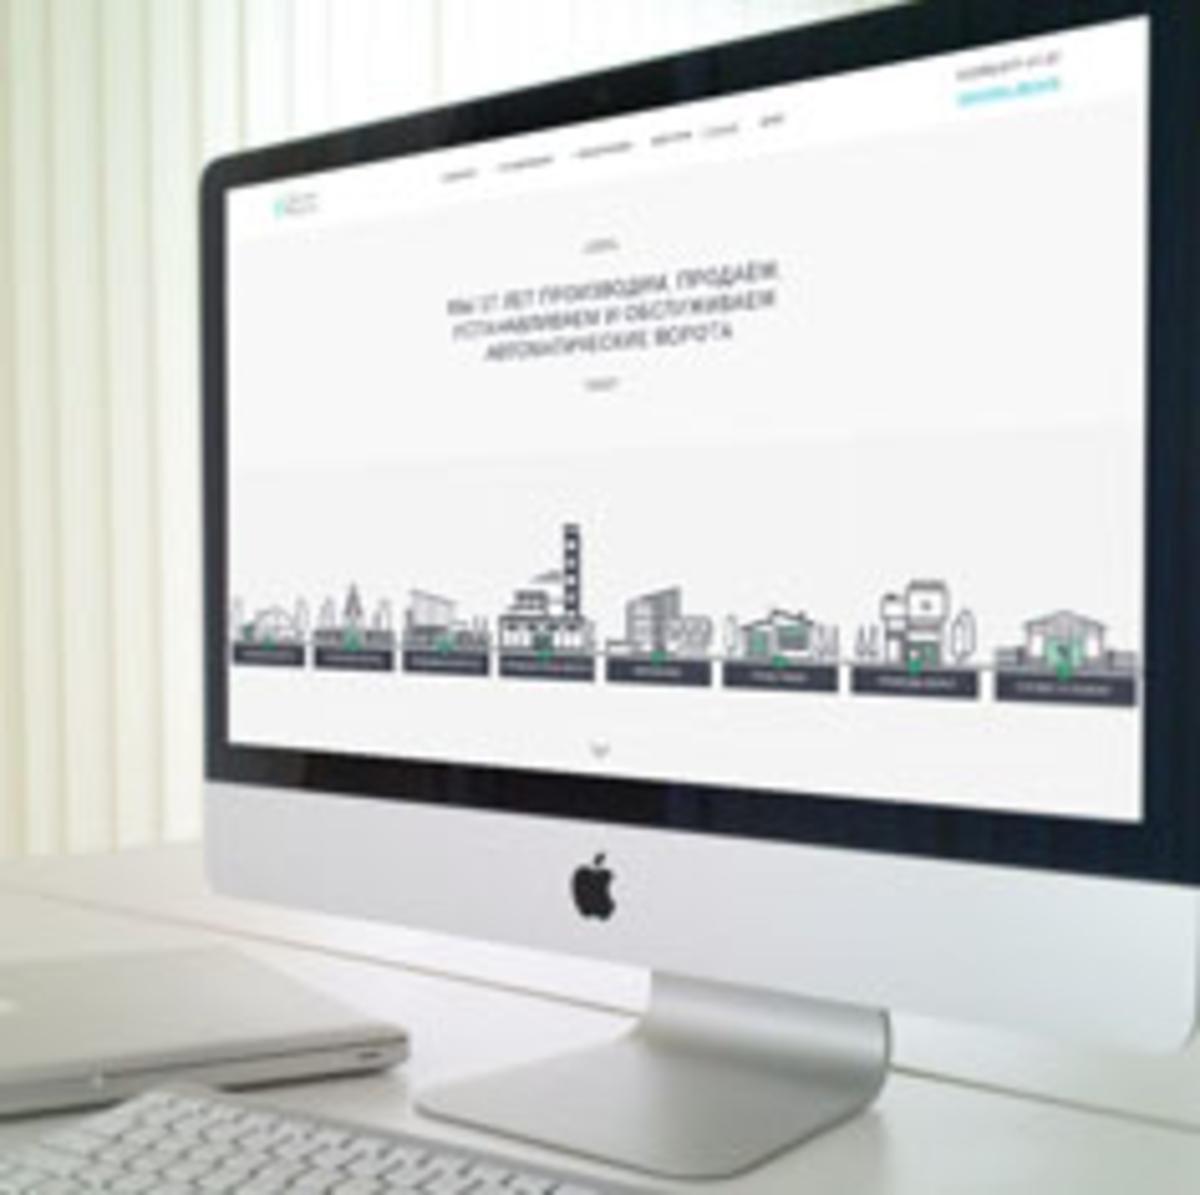 Производство и продажа автоматических ворот и автоматики / Проект компании Elgraphics